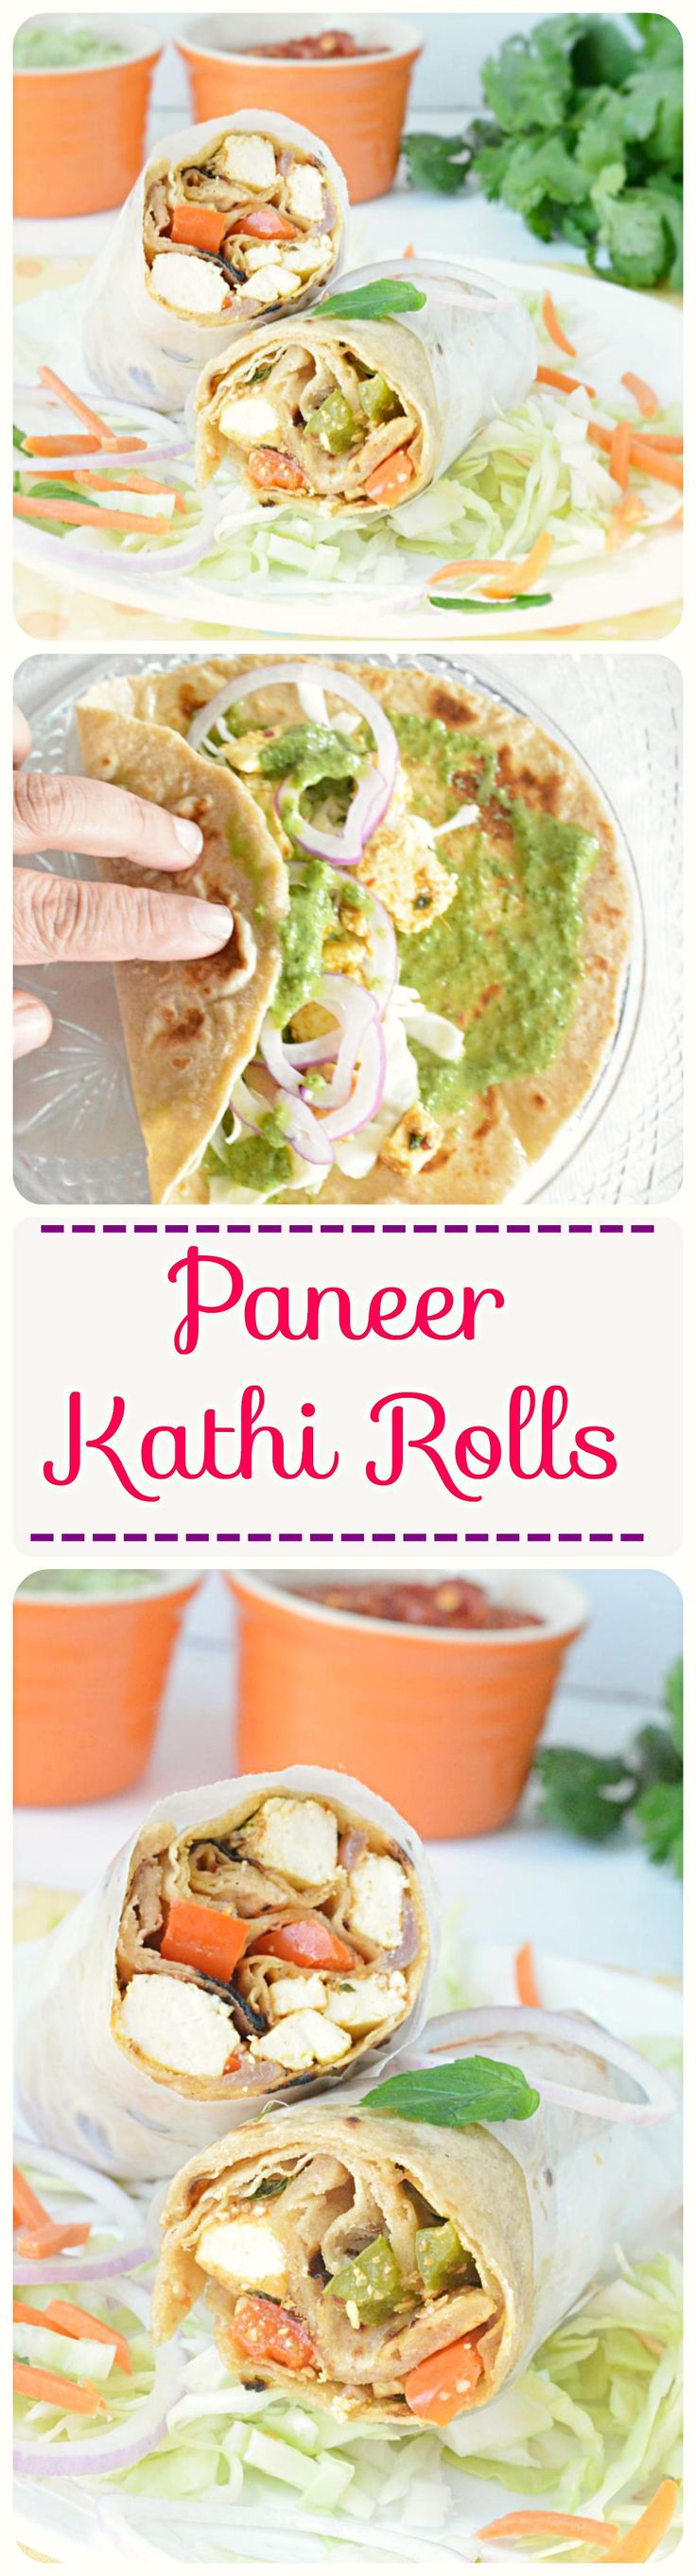 Freshly prepared Indian chapati stuffed with green chutney, lettuce and sauteed #Kadaipaneer. Yum and delicious Kolkata Specialty!! #kathirolls #katirolls